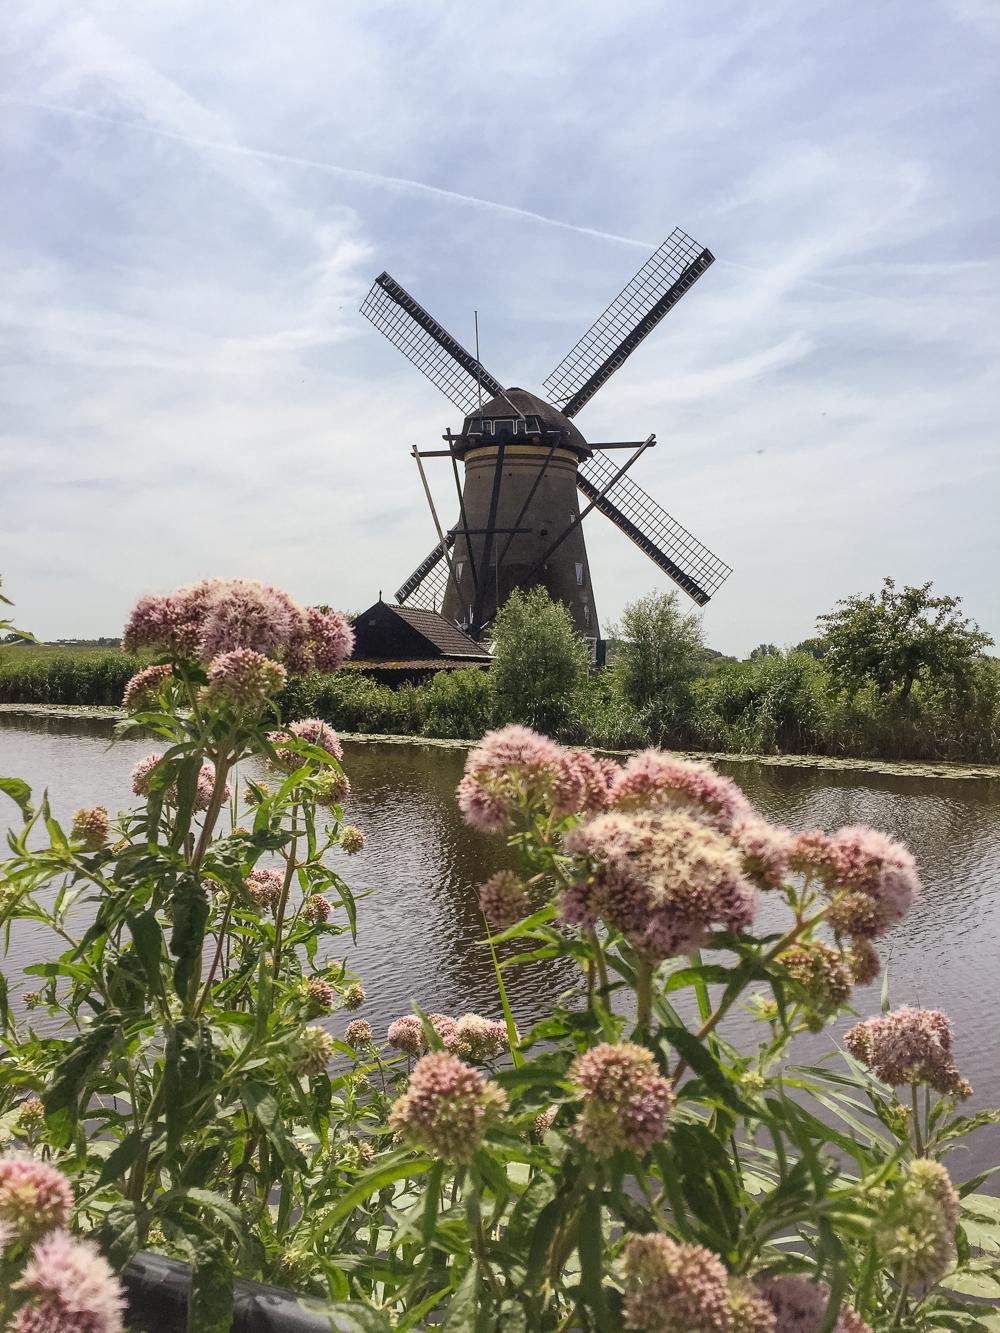 The windmills of Kinderdijk, Holland